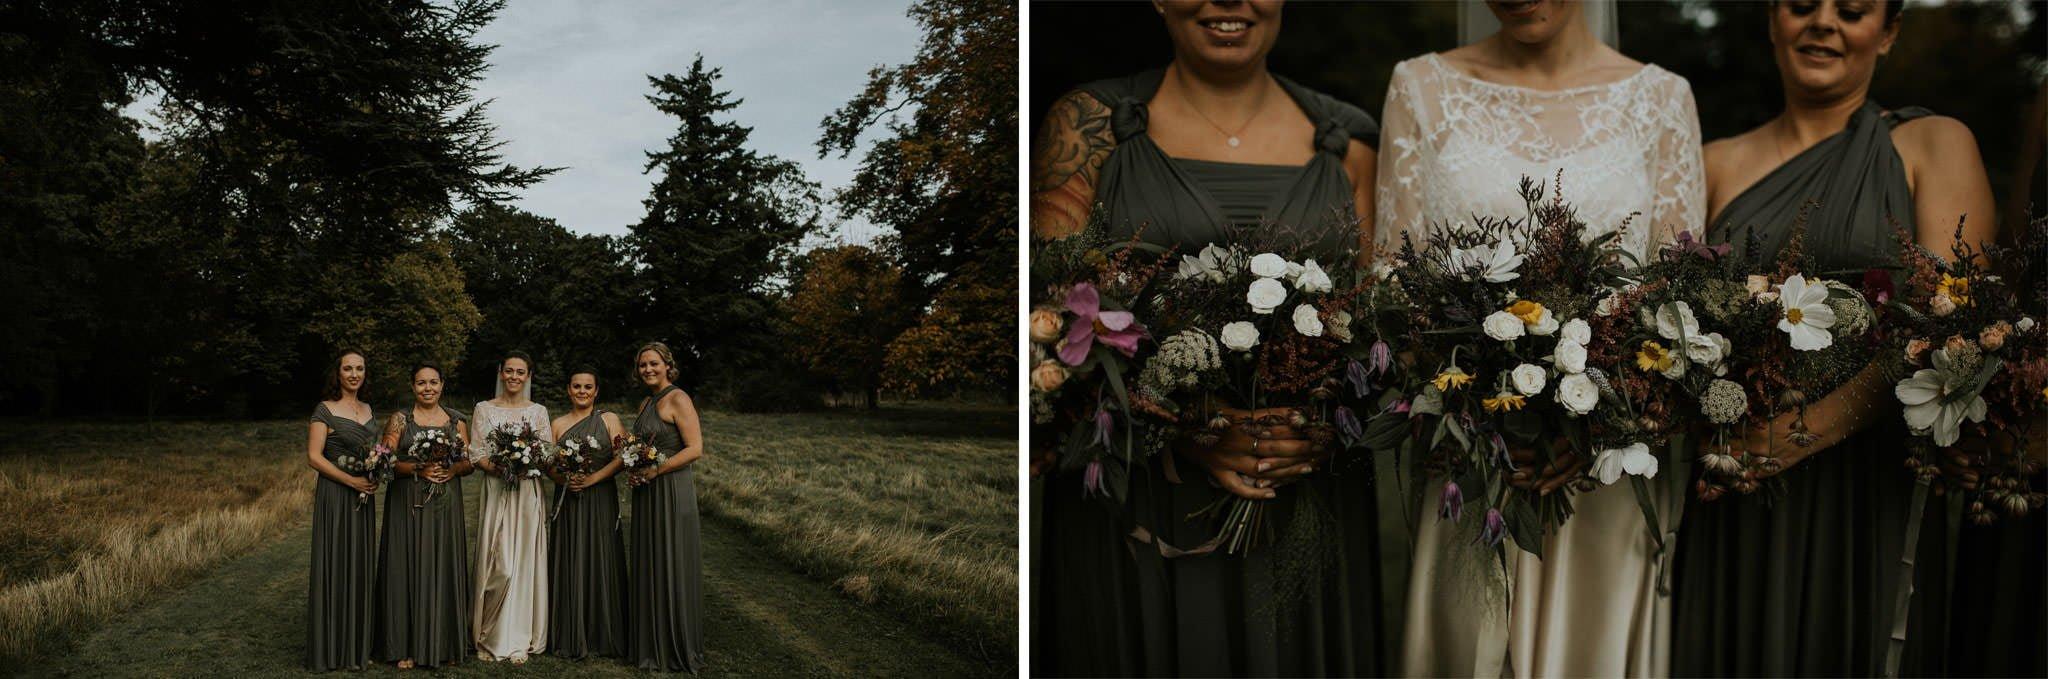 fine-art-wedding-photography-scotland 086